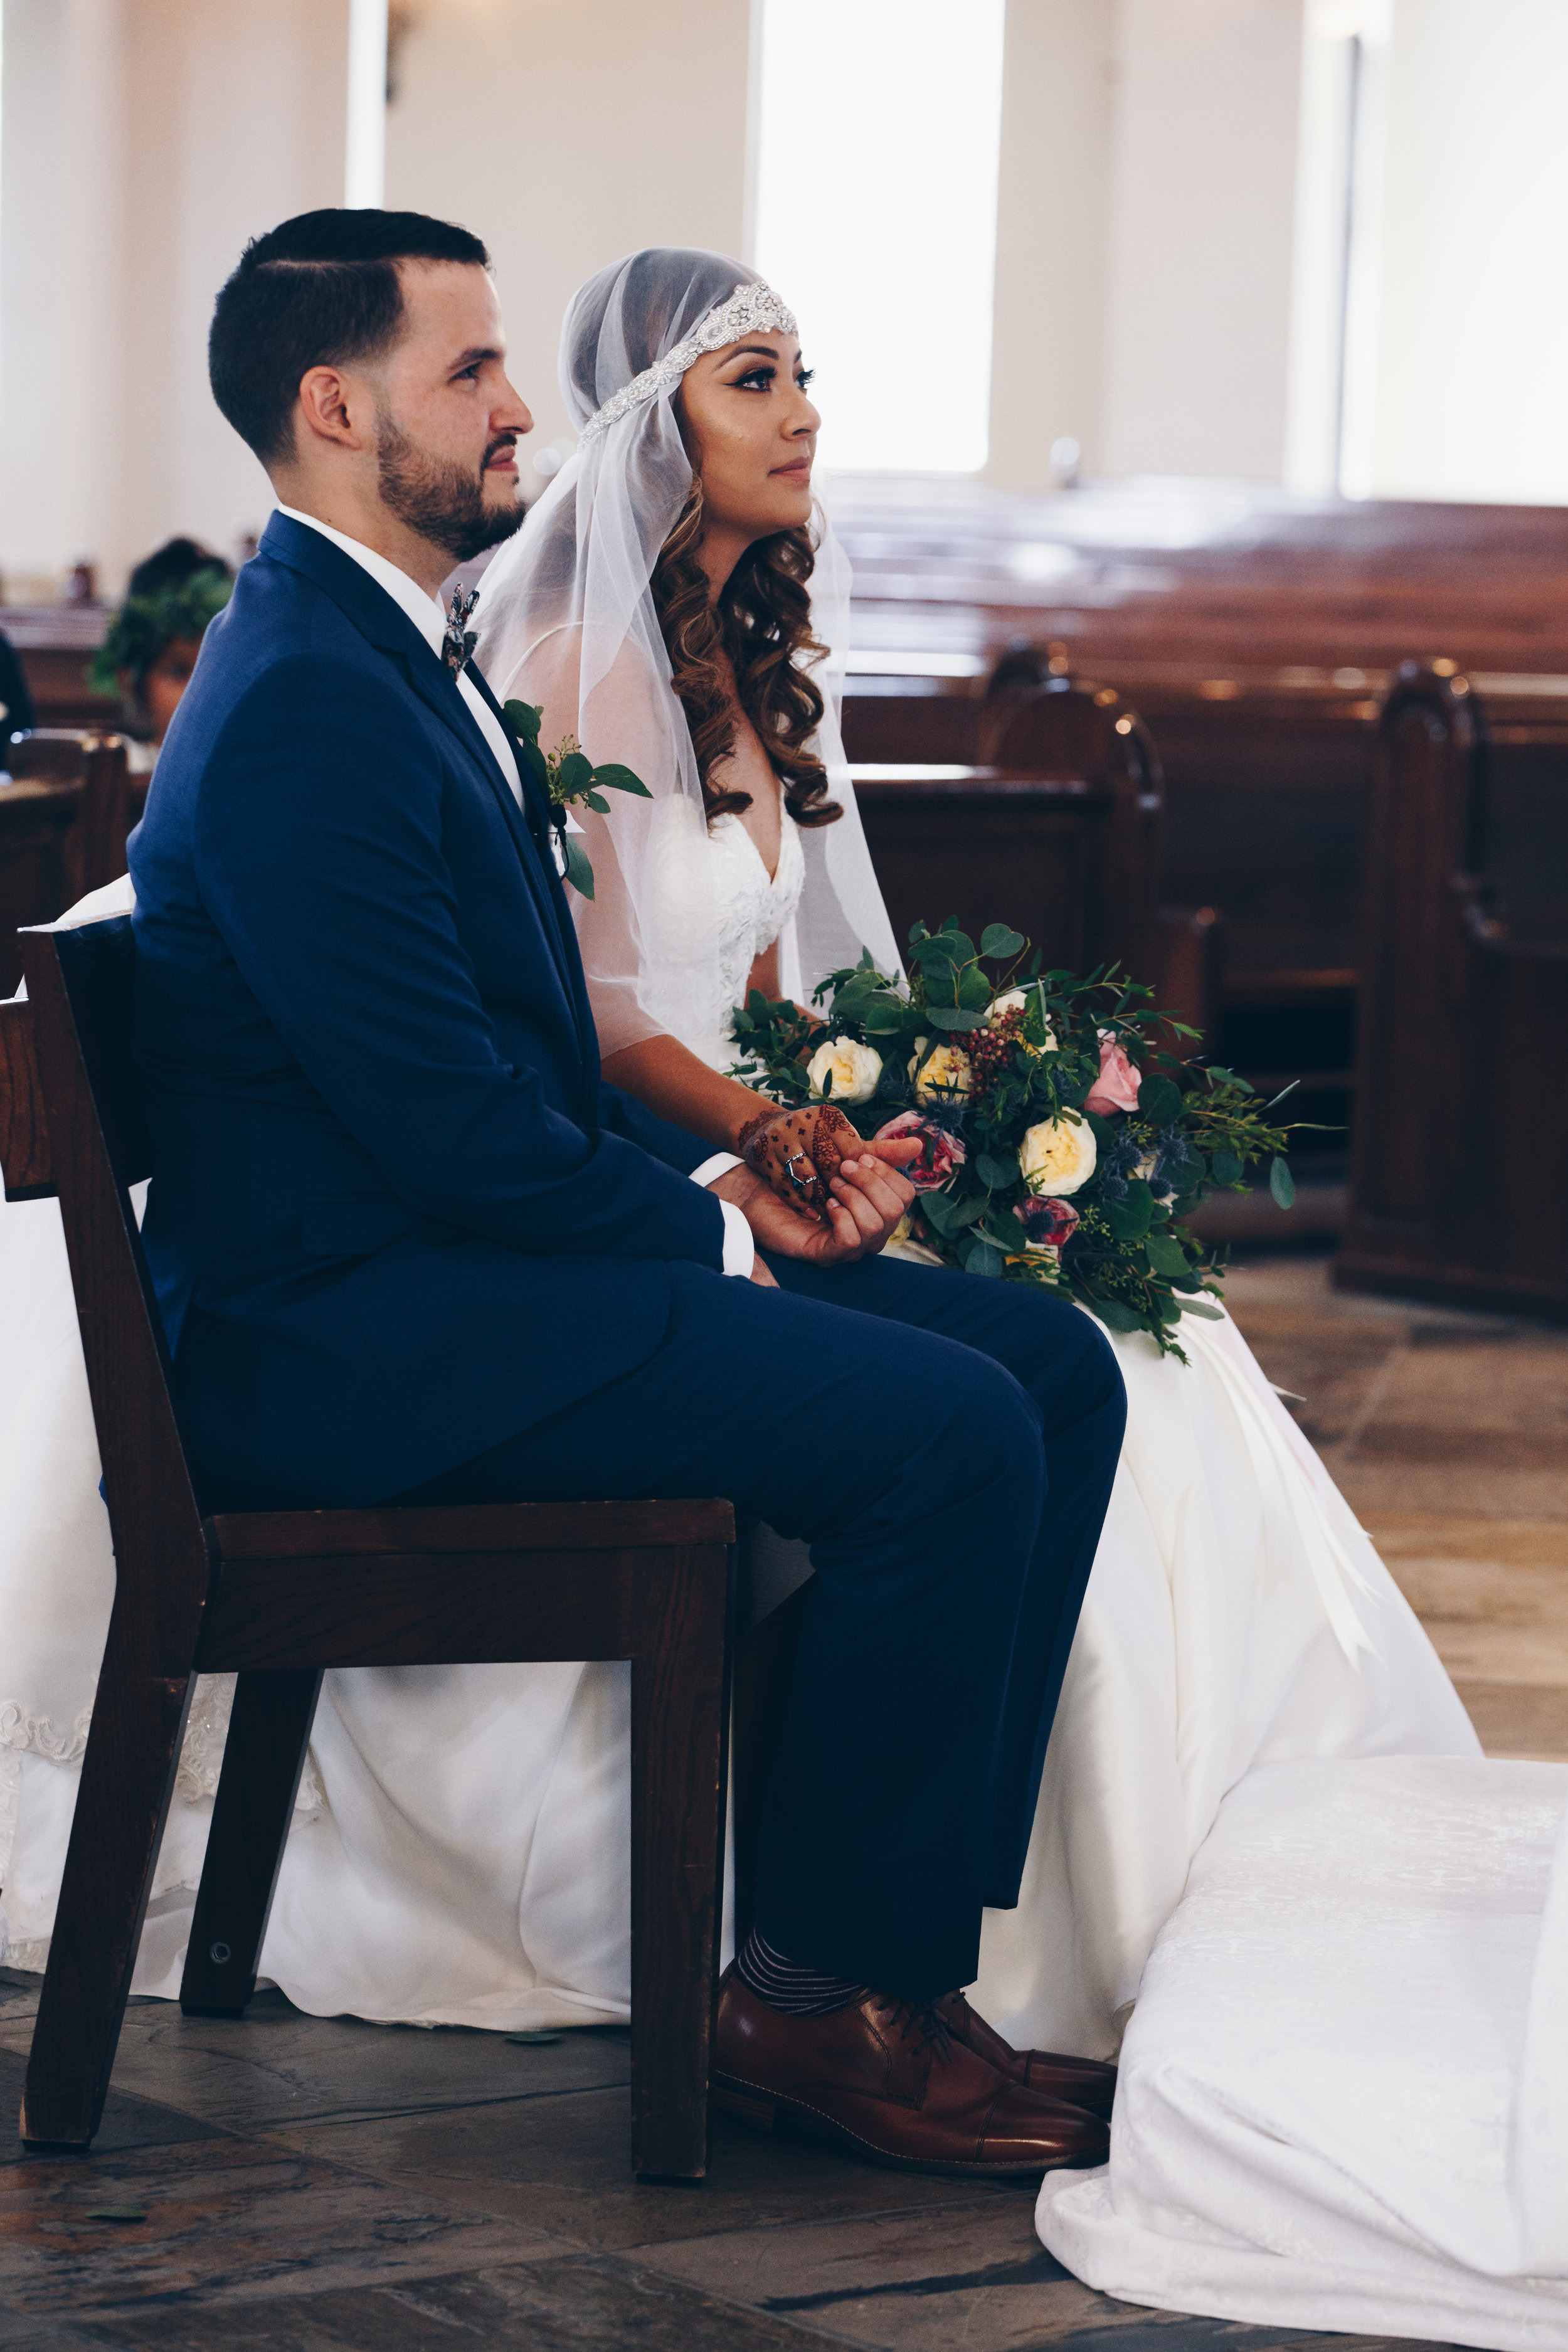 Veronica & Adrian Wedding 13 (1 of 1).jpg